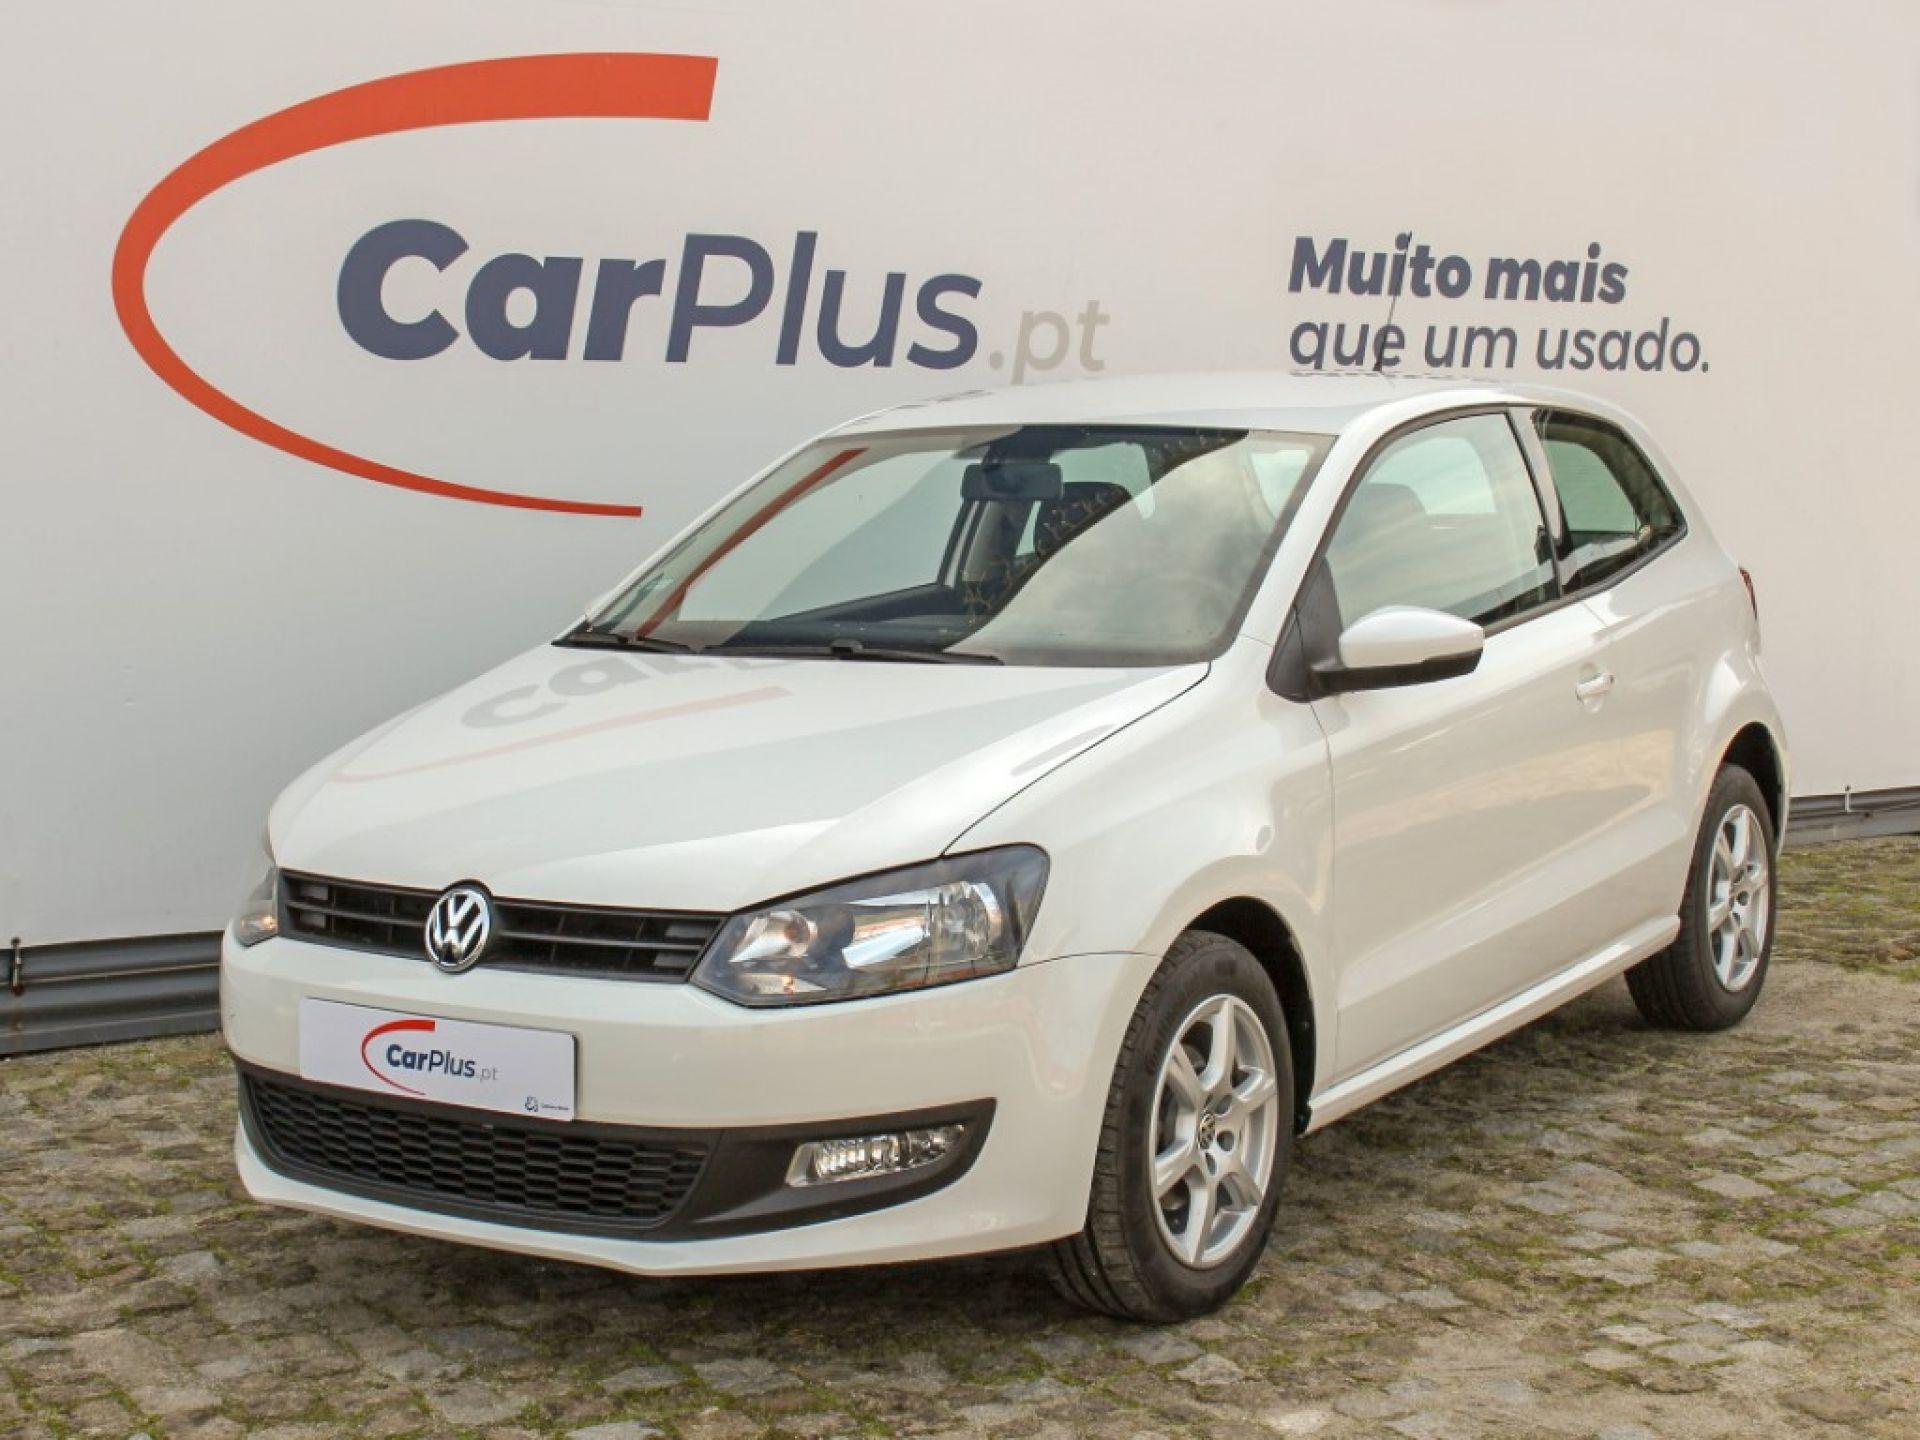 Volkswagen Polo 1.2I 60cv Trendline Pack segunda mão Porto